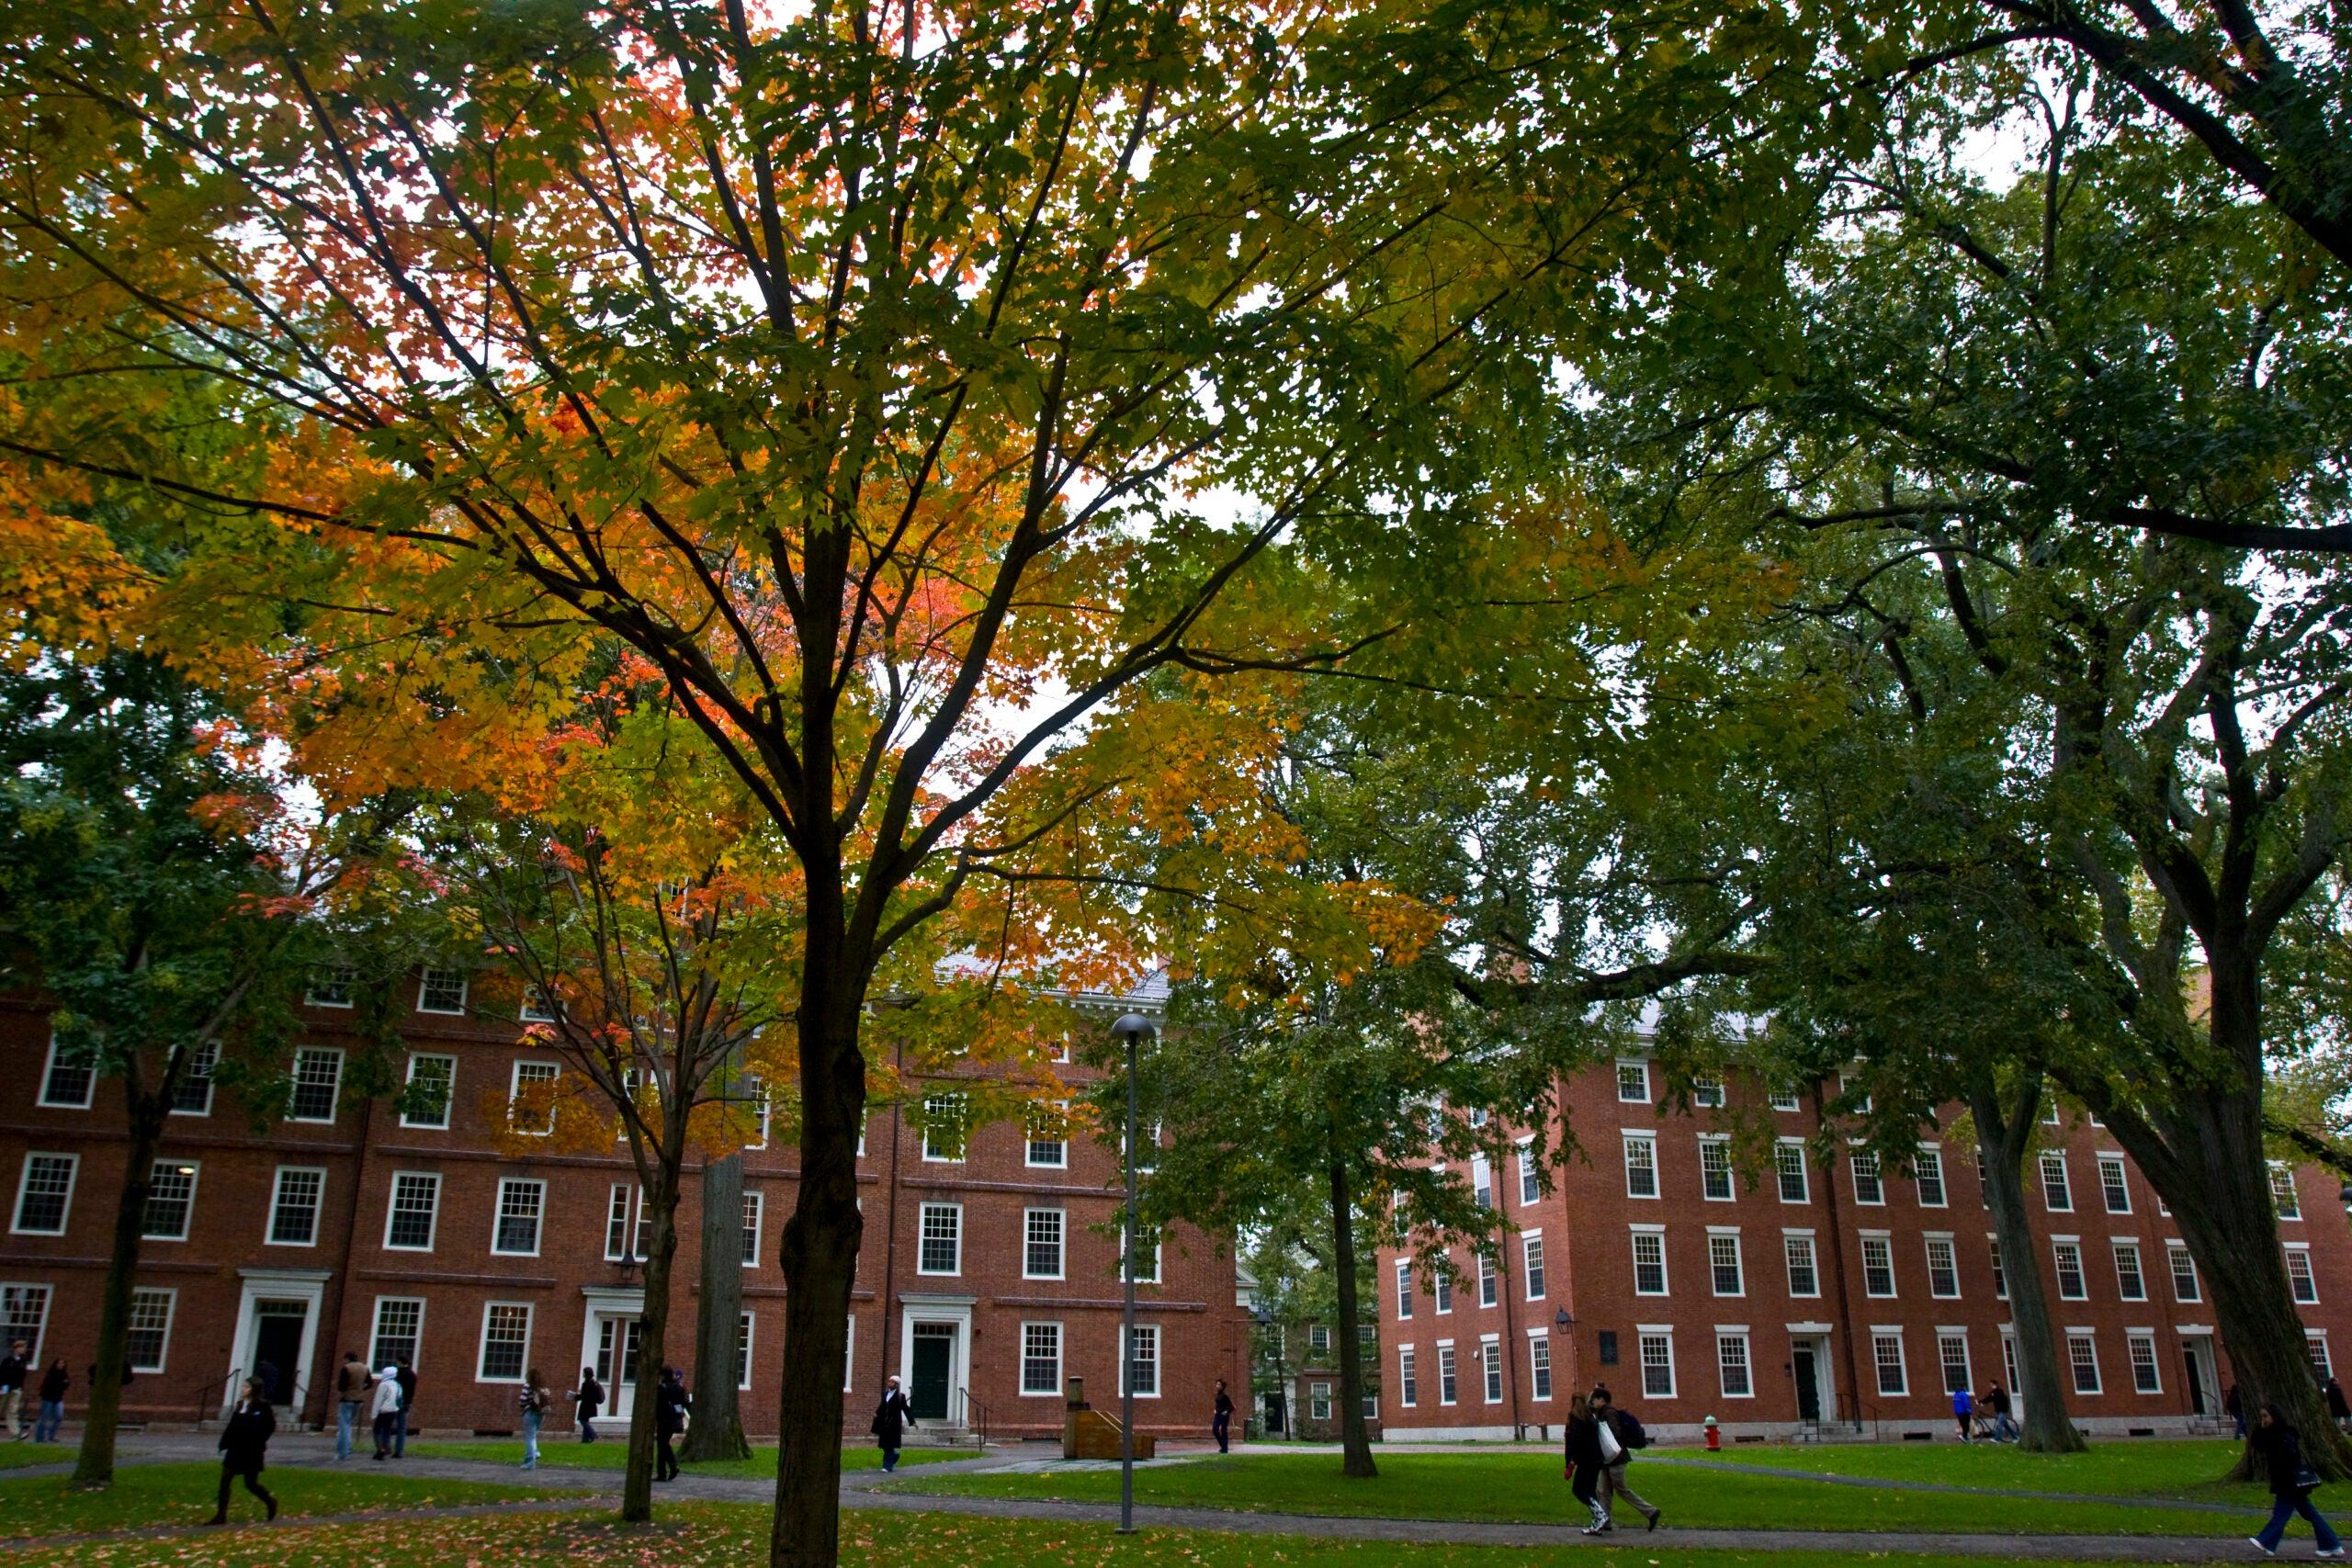 The dorms in Harvard Yard